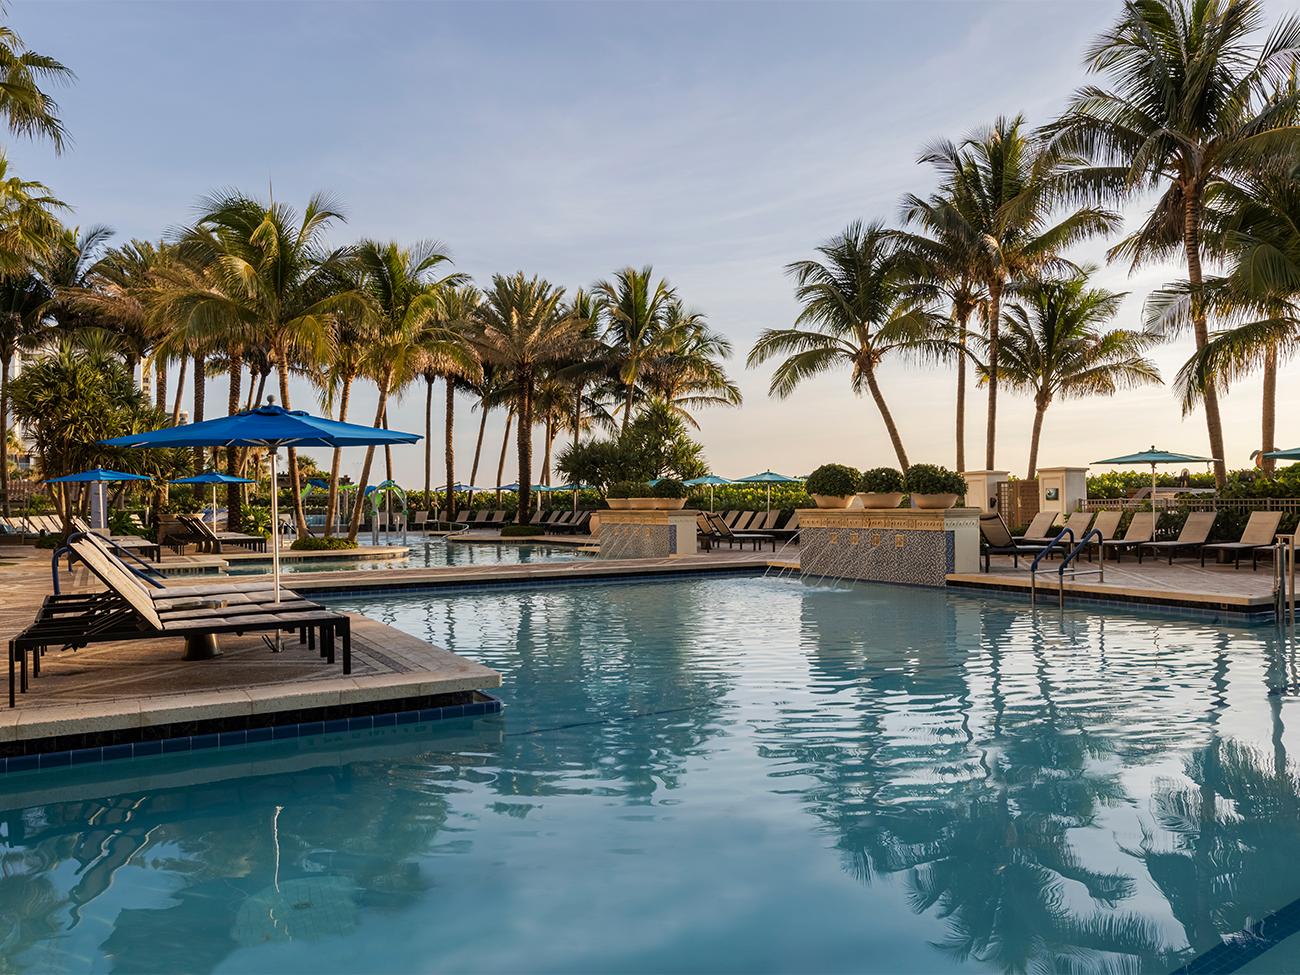 Marriott's Oceana Palms Lap Pool. Marriott's Oceana Palms is located in Riviera Beach, Florida United States.